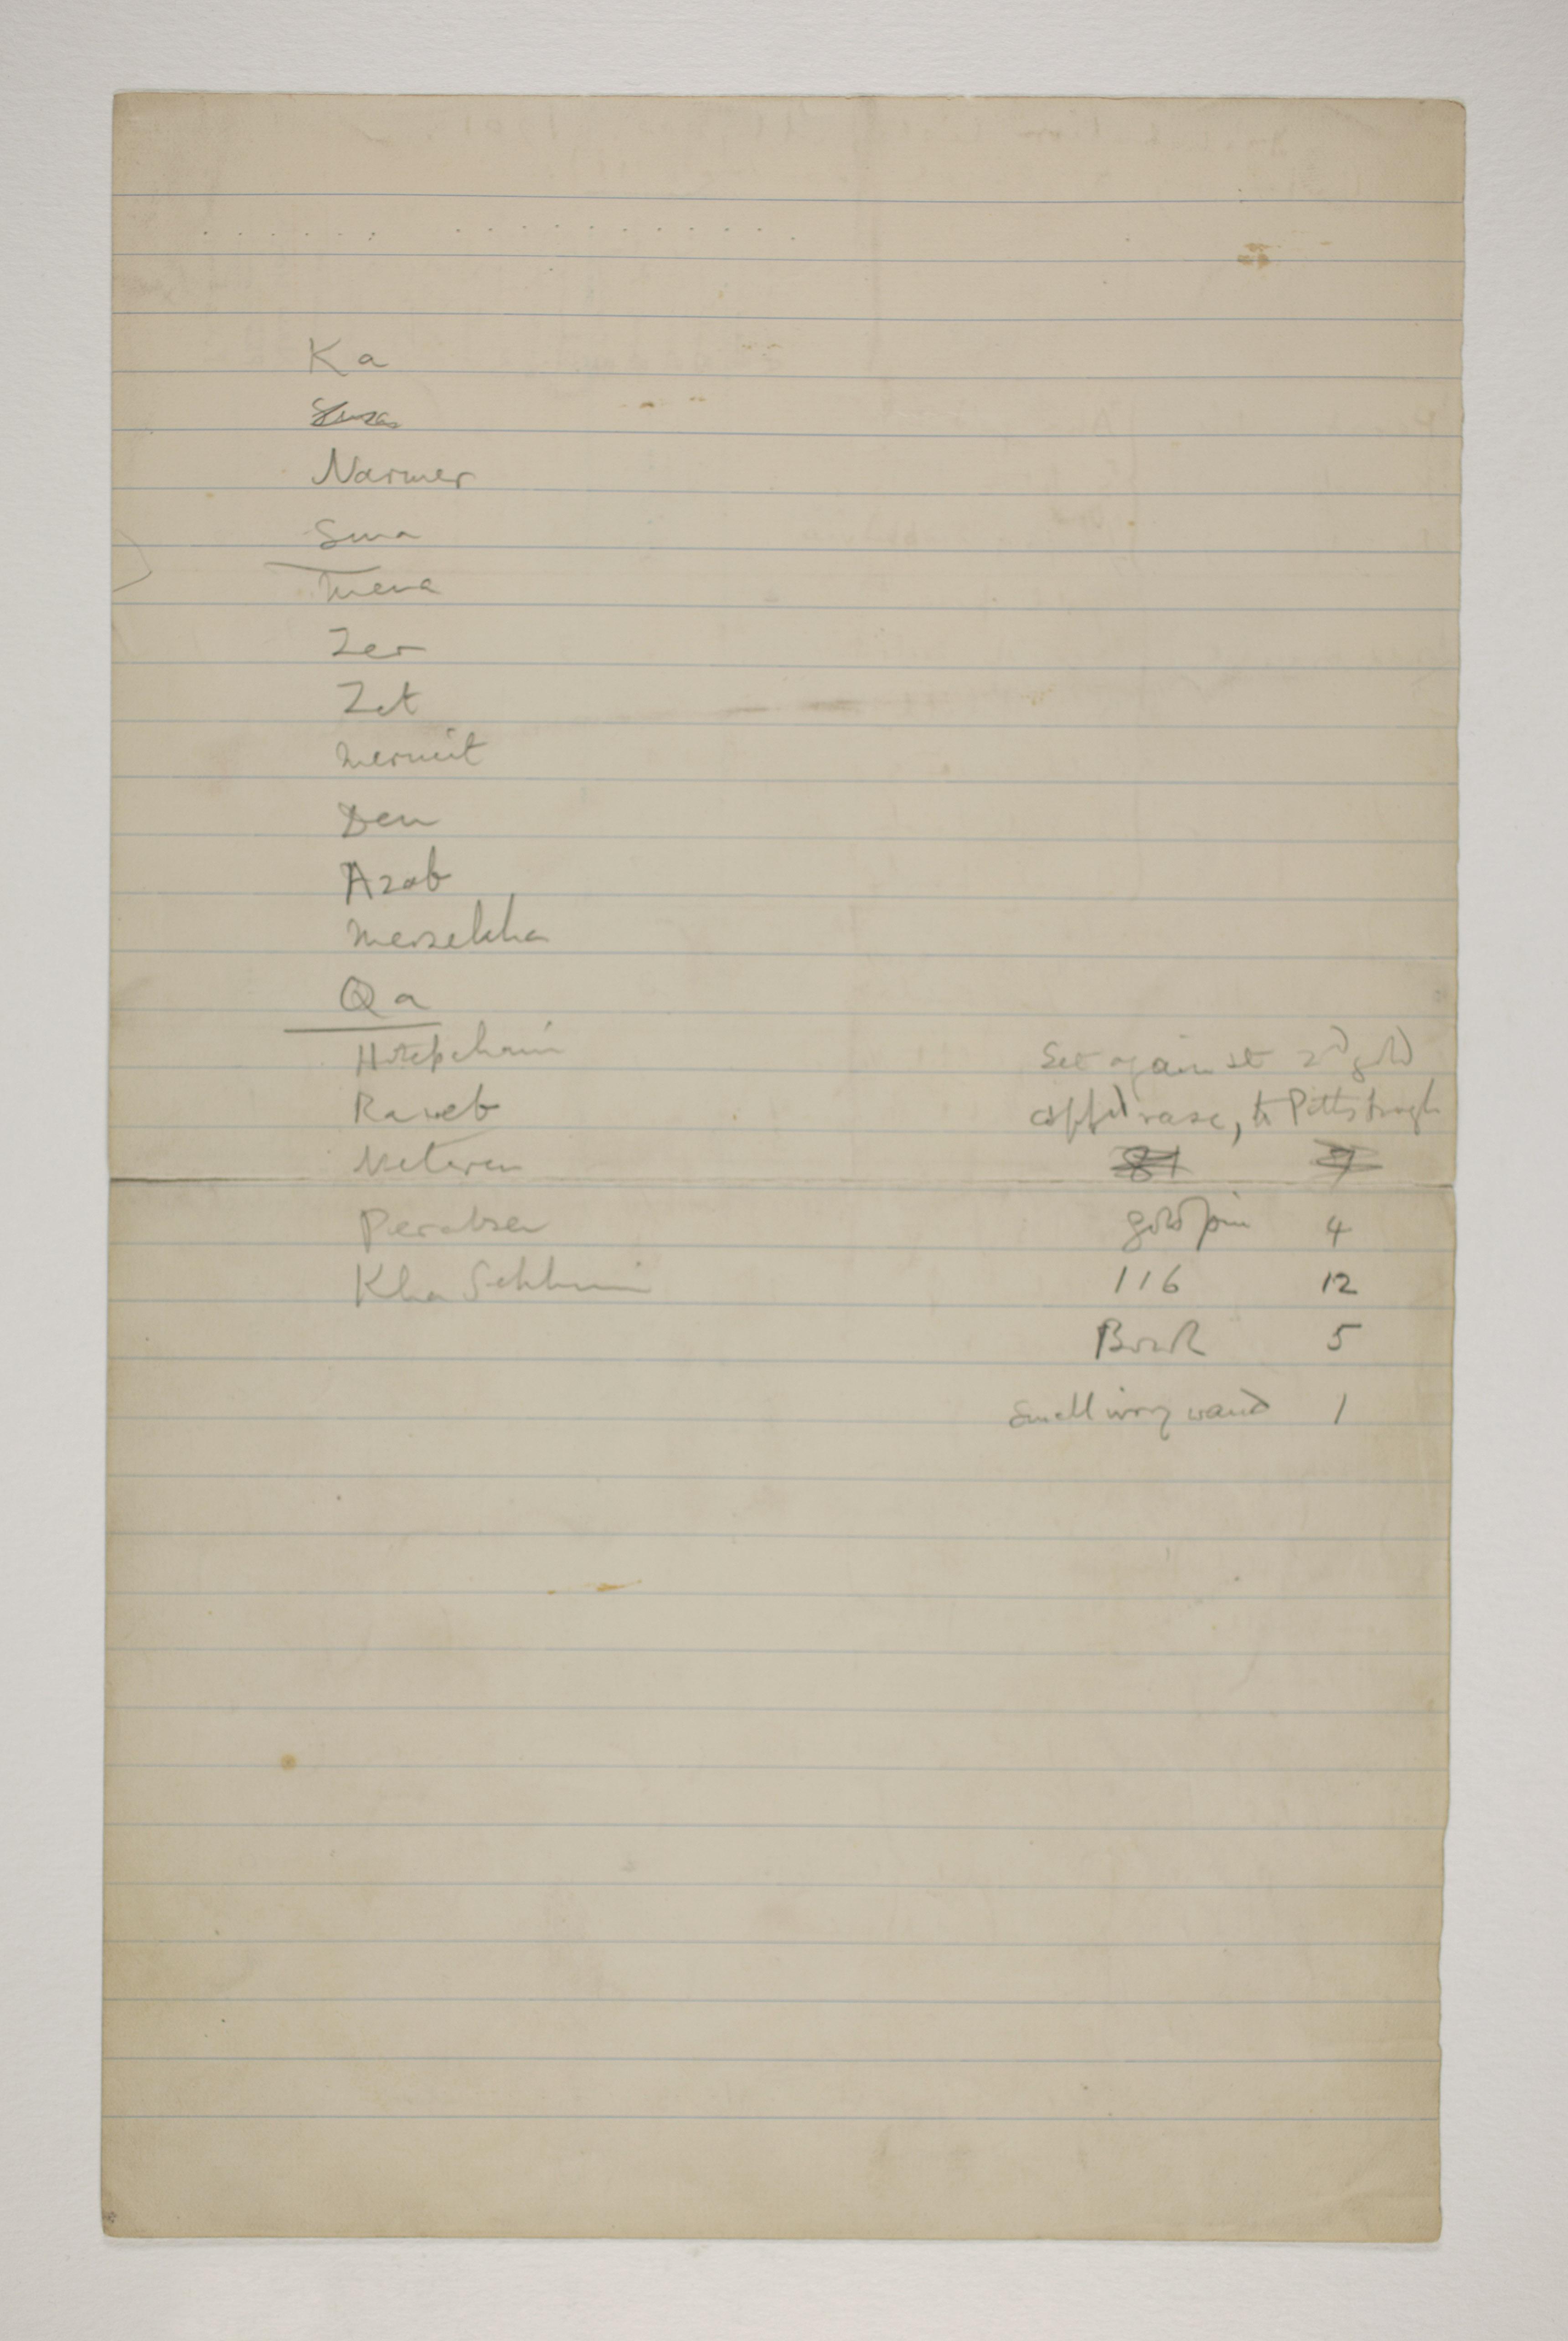 1900-01 Abydos, Bet Khallaf, el-Mahasna Distribution list PMA/WFP1/D/9/5.2